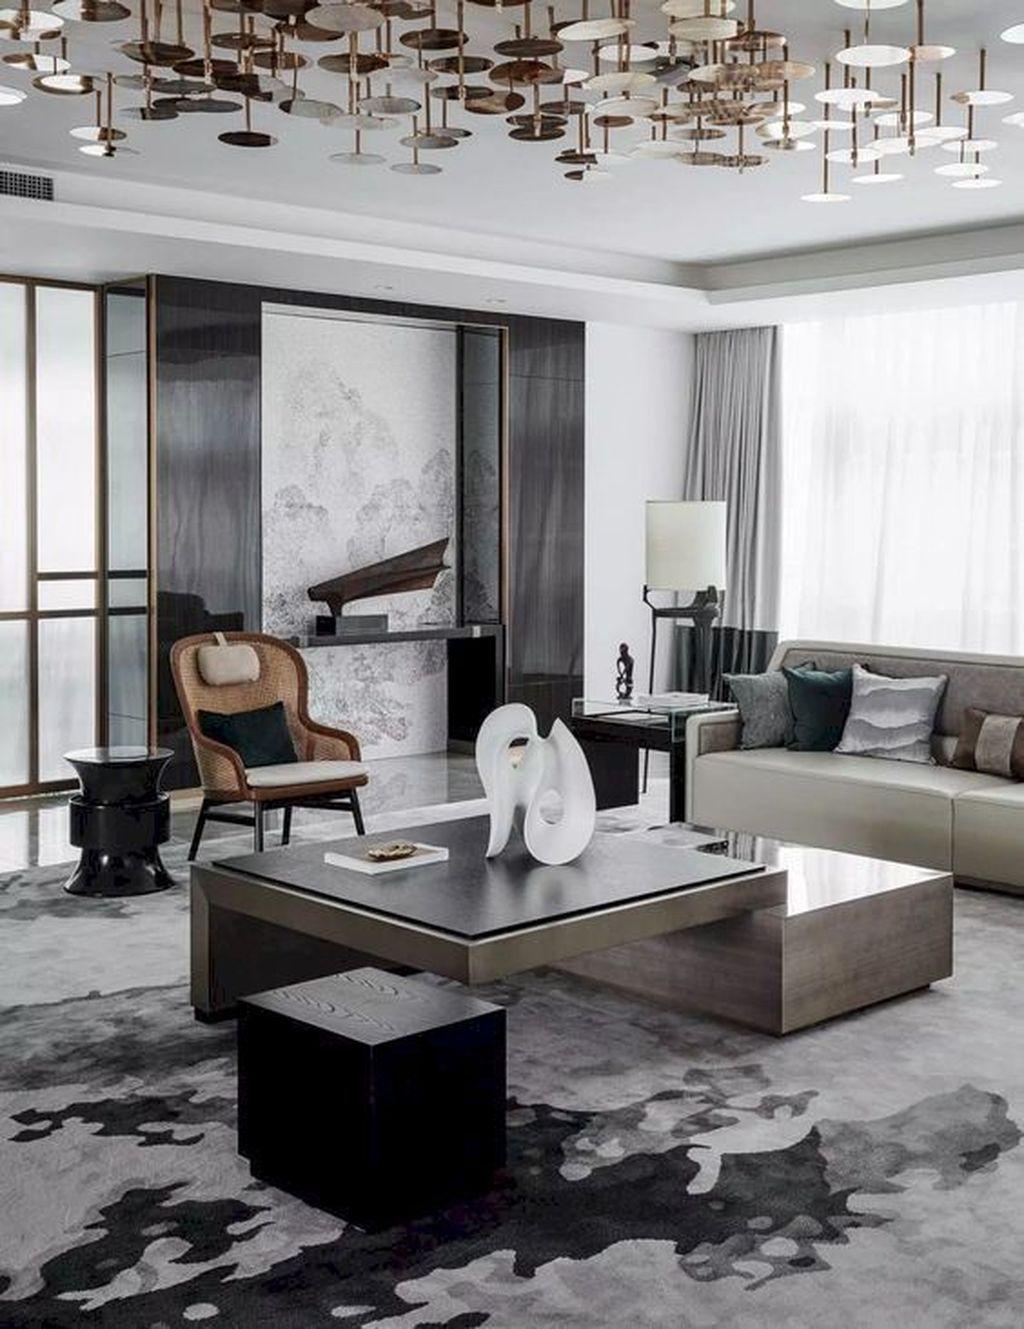 Beautiful Contemporary Interior Design Ideas You Never Seen Before 11